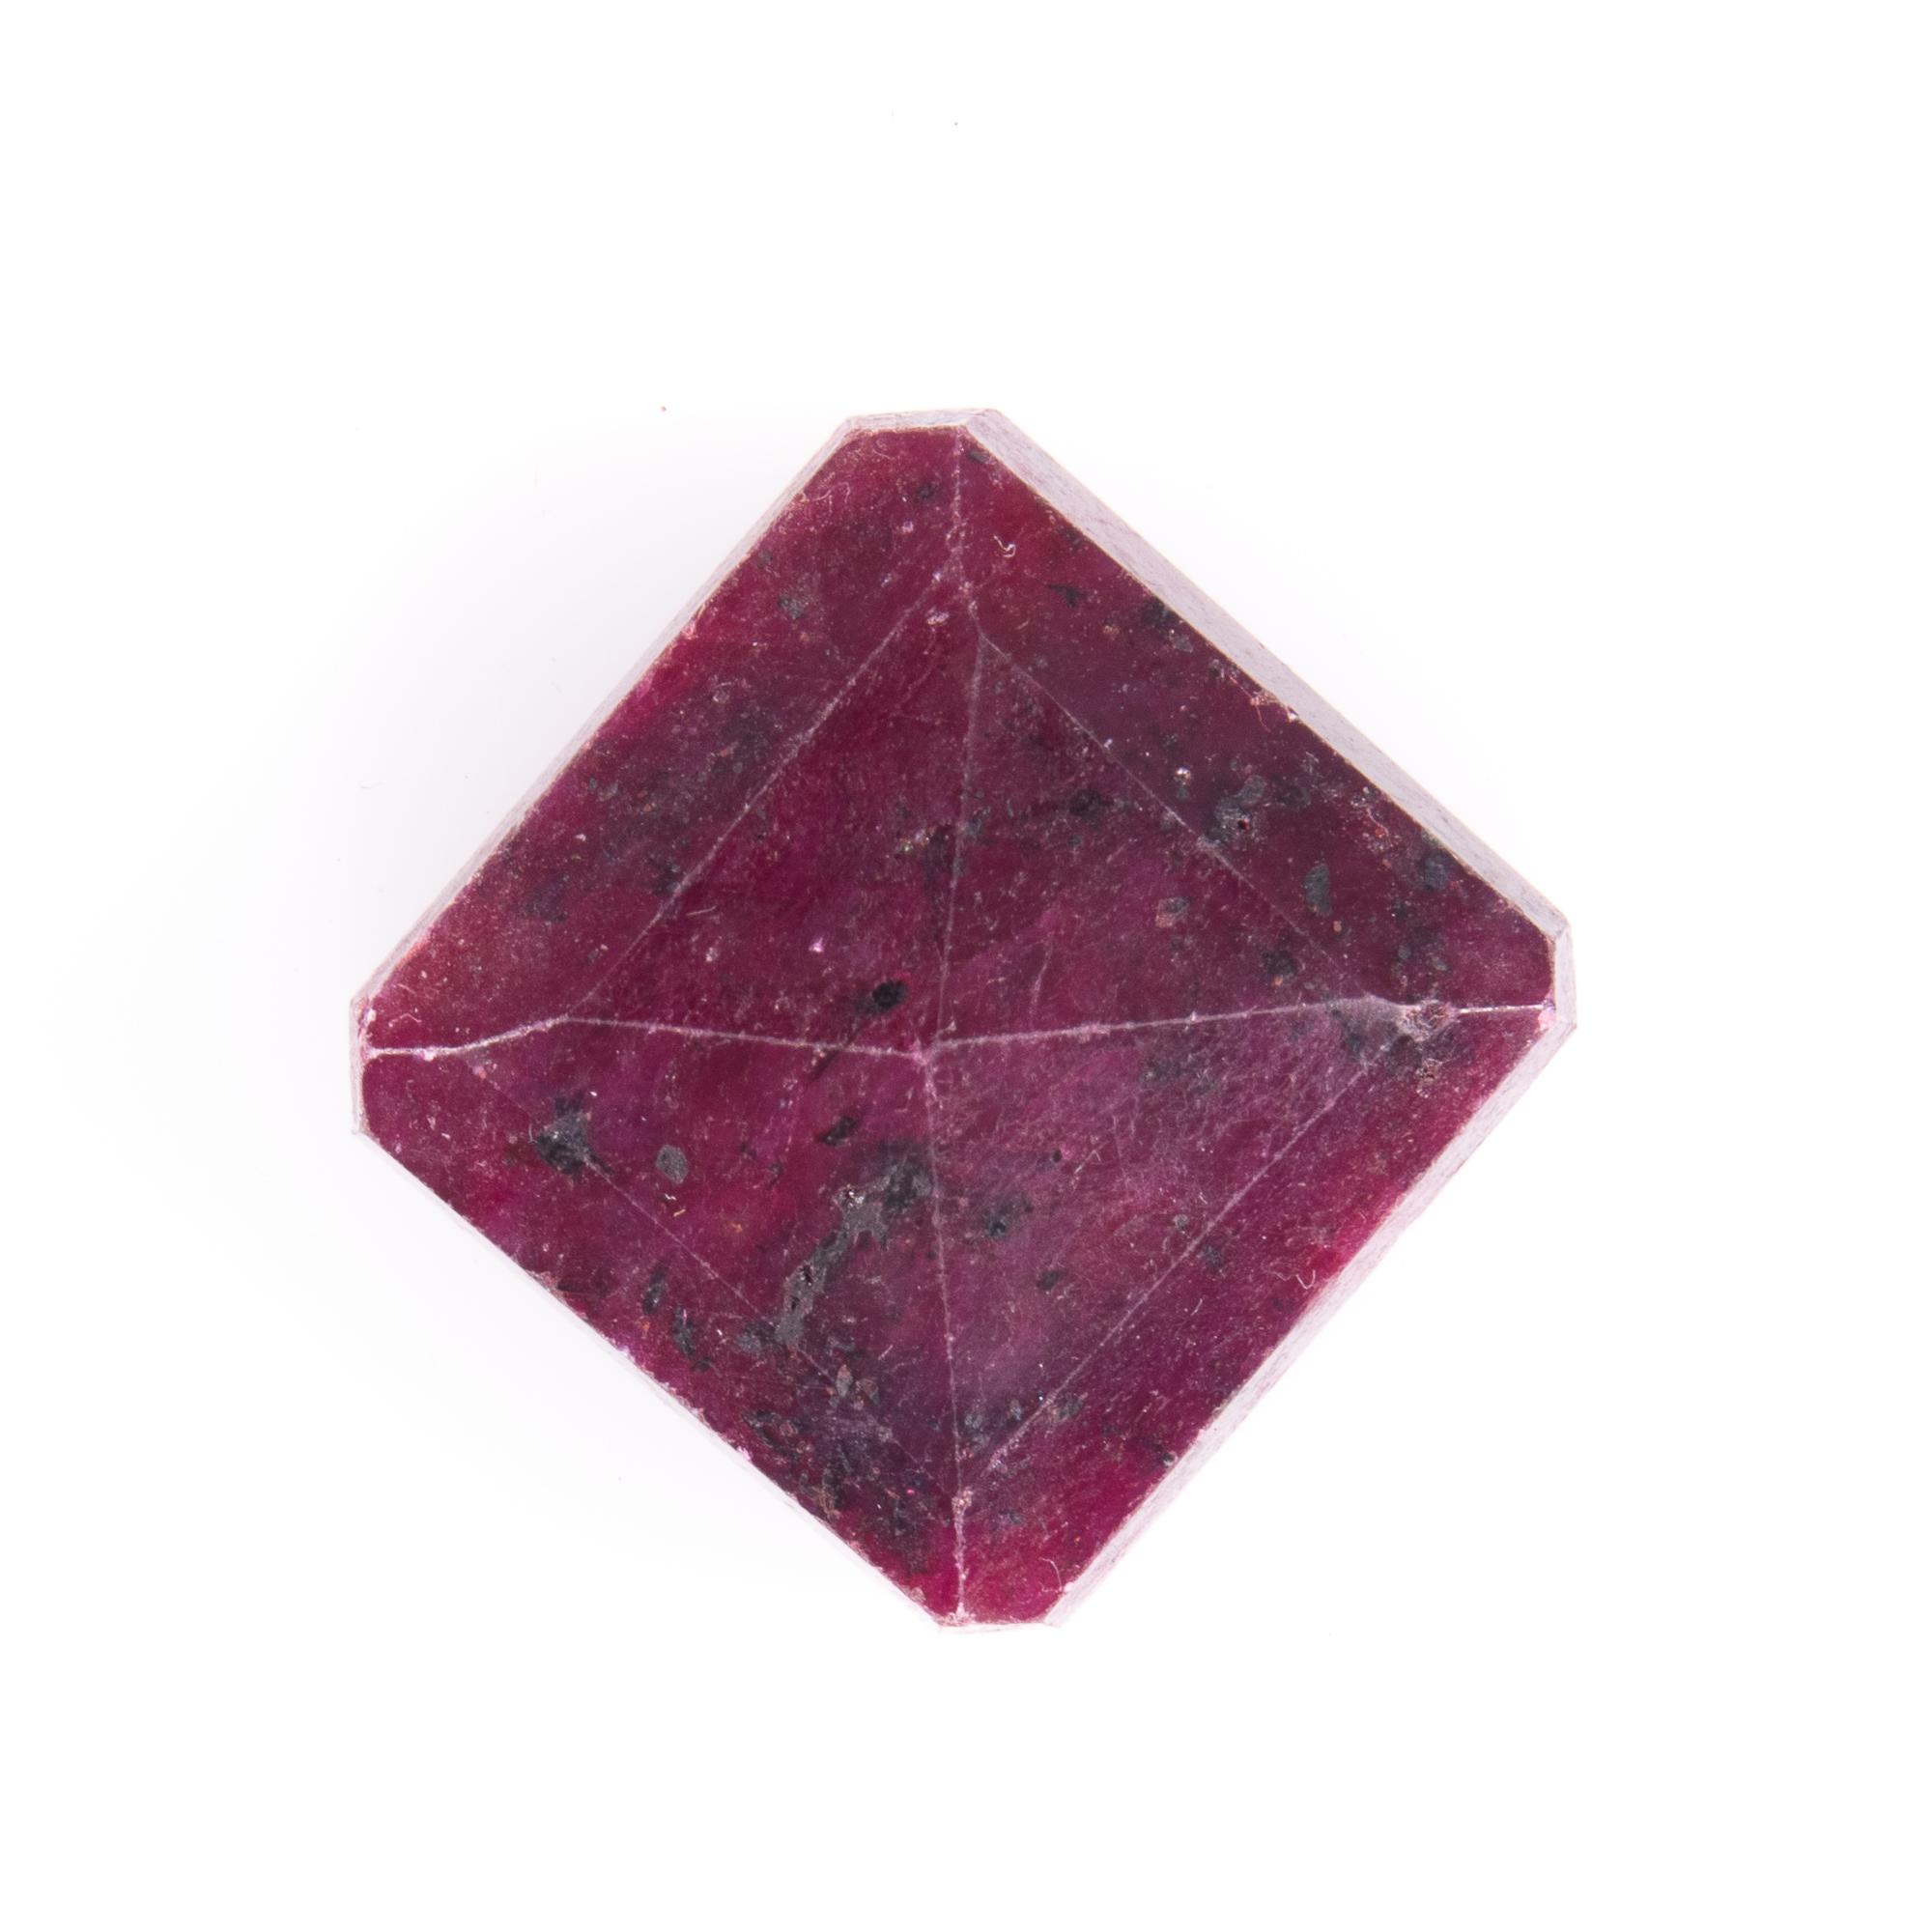 127ct Ruby Gemstone - Image 3 of 7